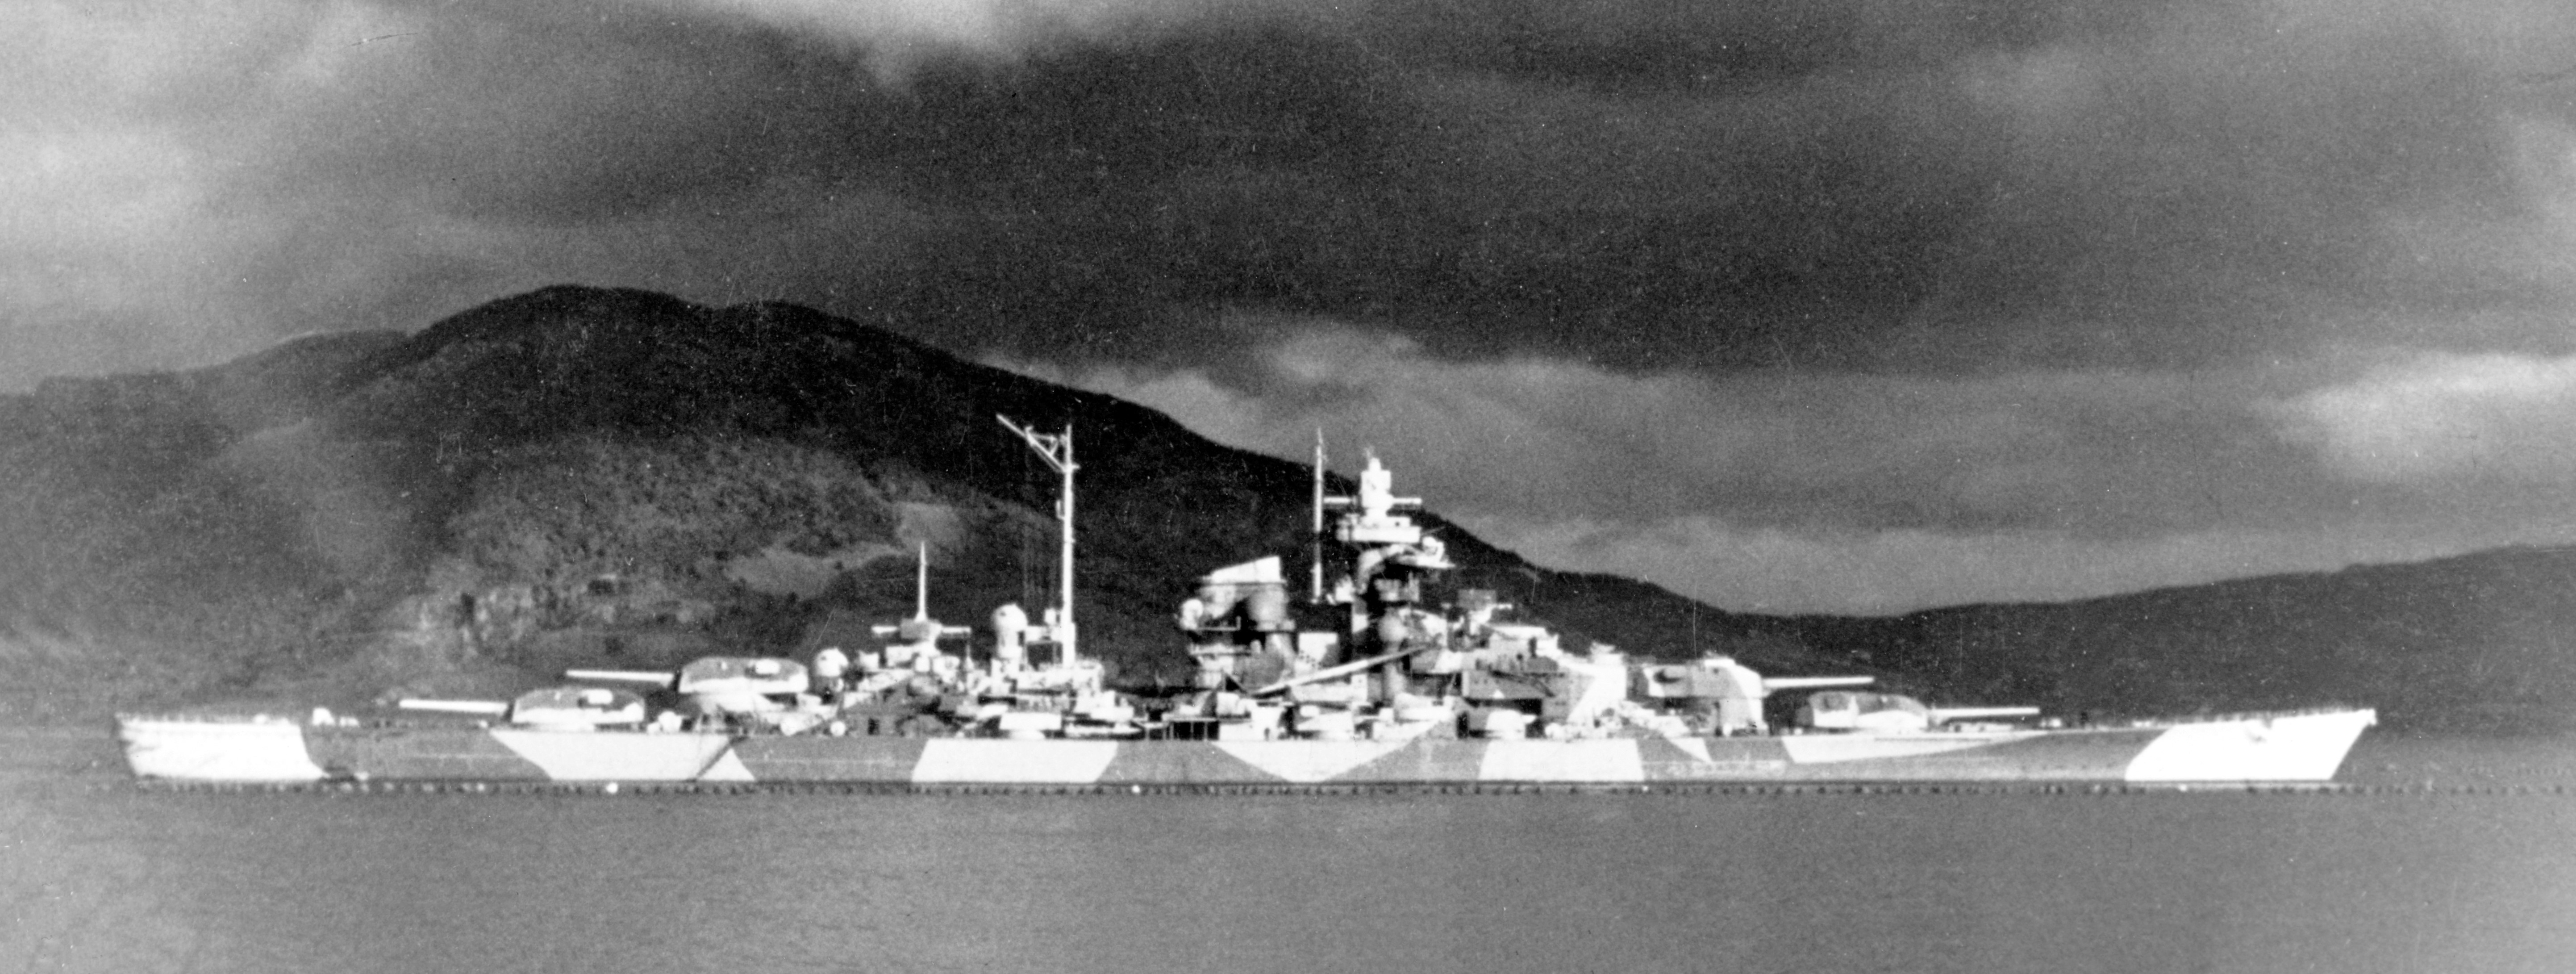 Ficheiro:Tirpitz altafjord.jpg